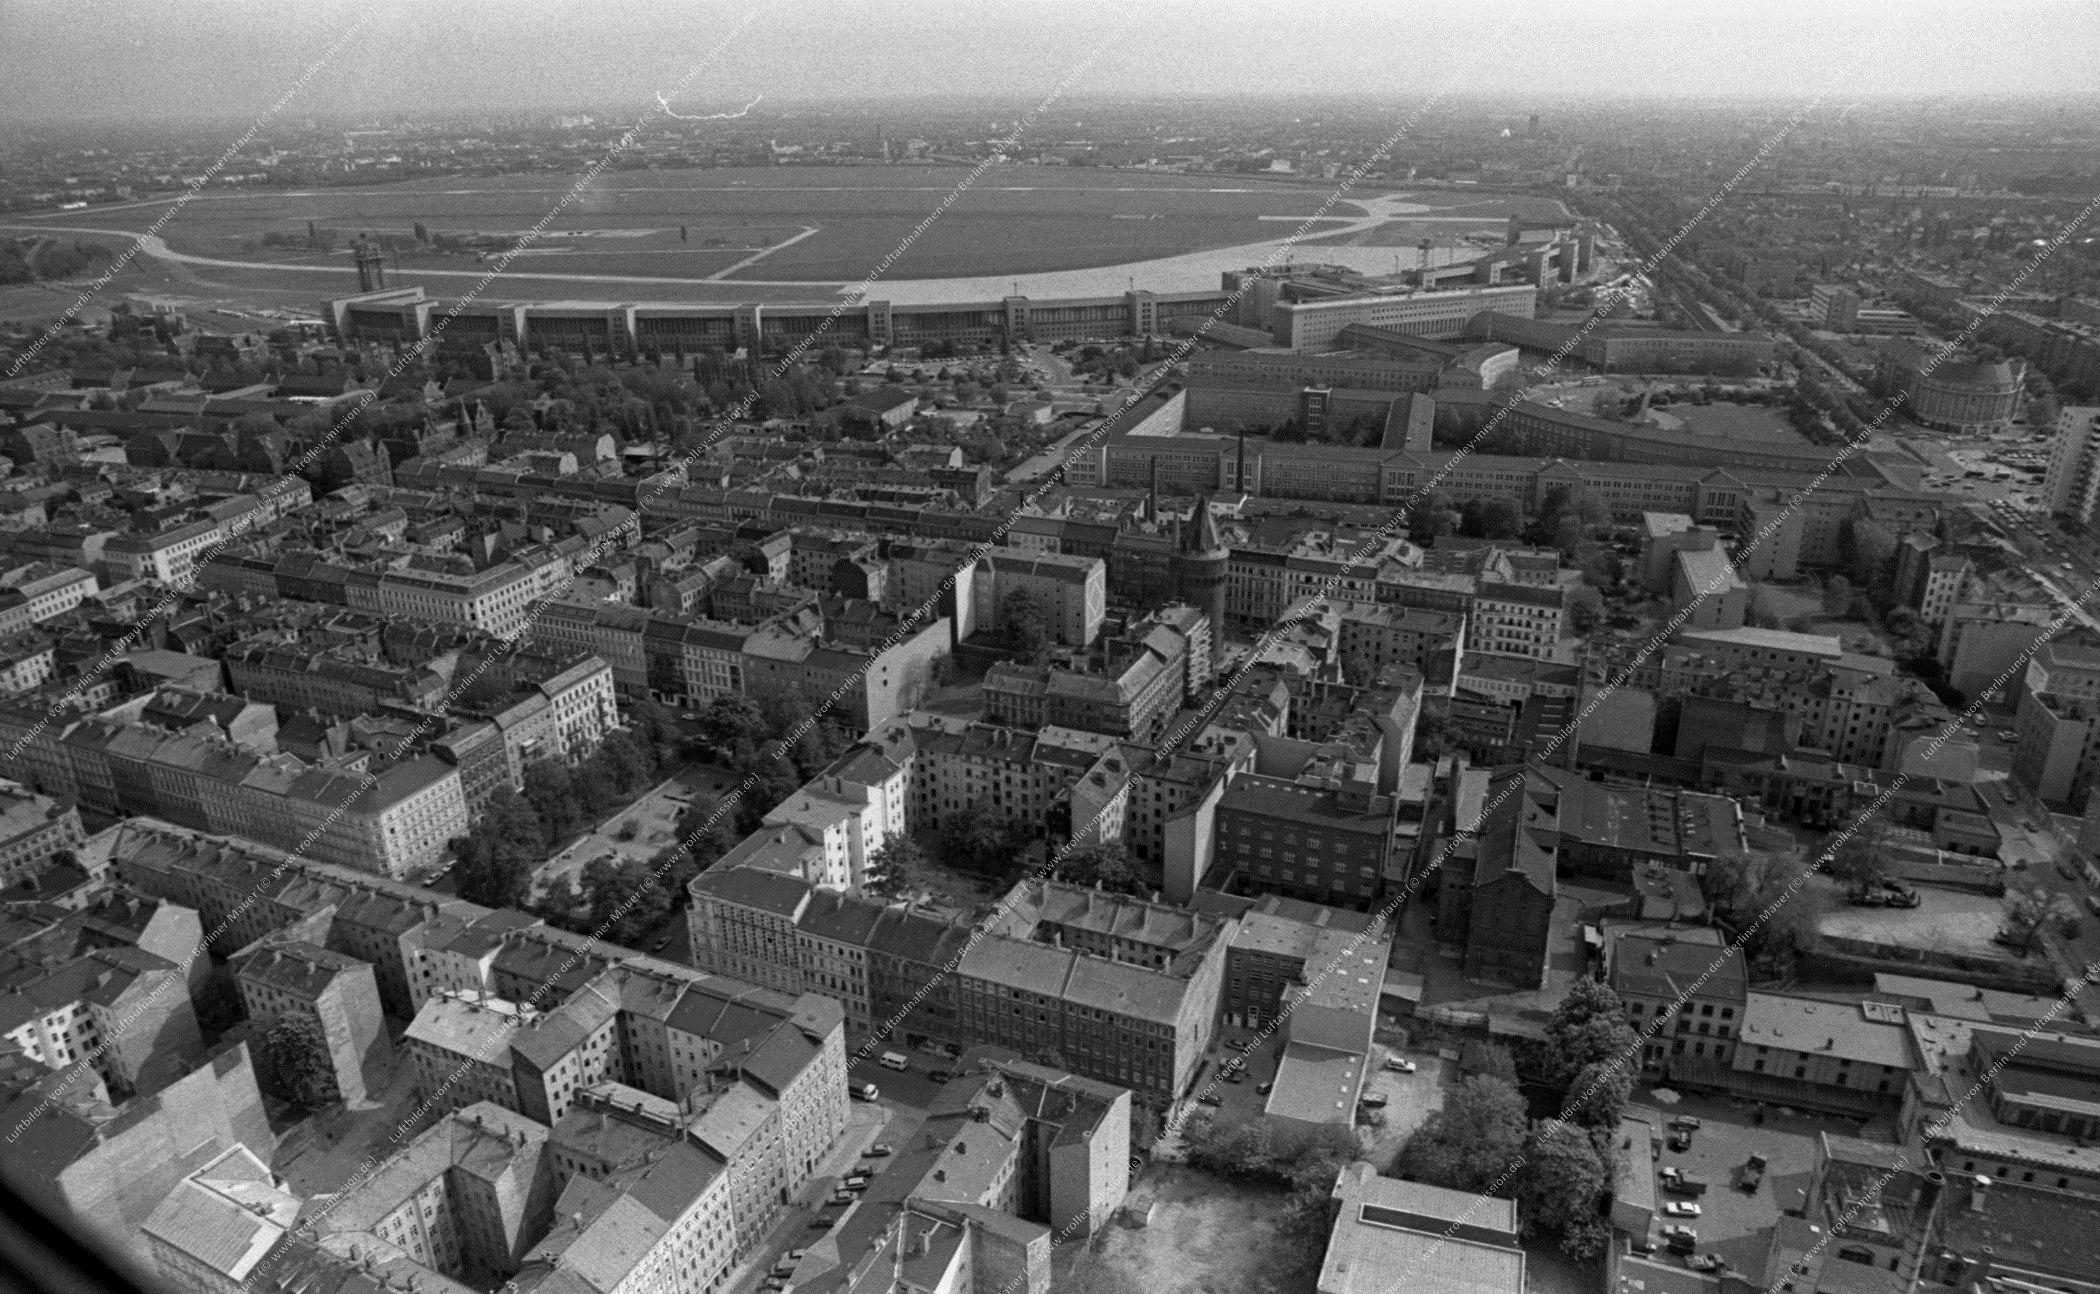 Berlin Luftbild Flughafen Tempelhof vom 12. Mai 1982 (Bild 066)